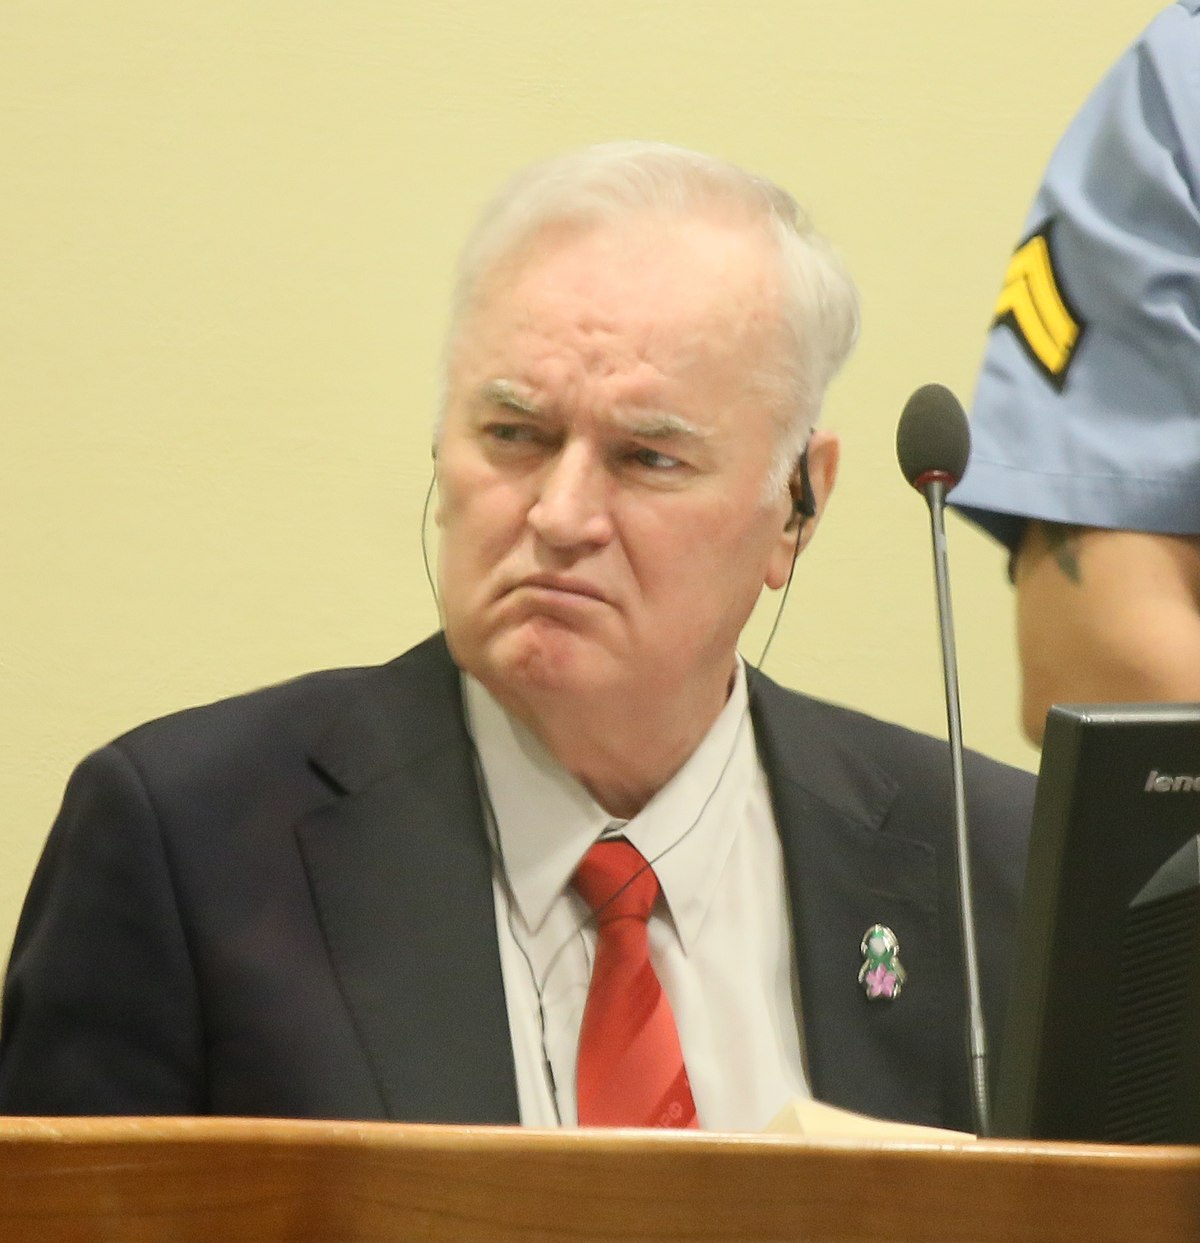 Ratko Mladić - Wikipedia